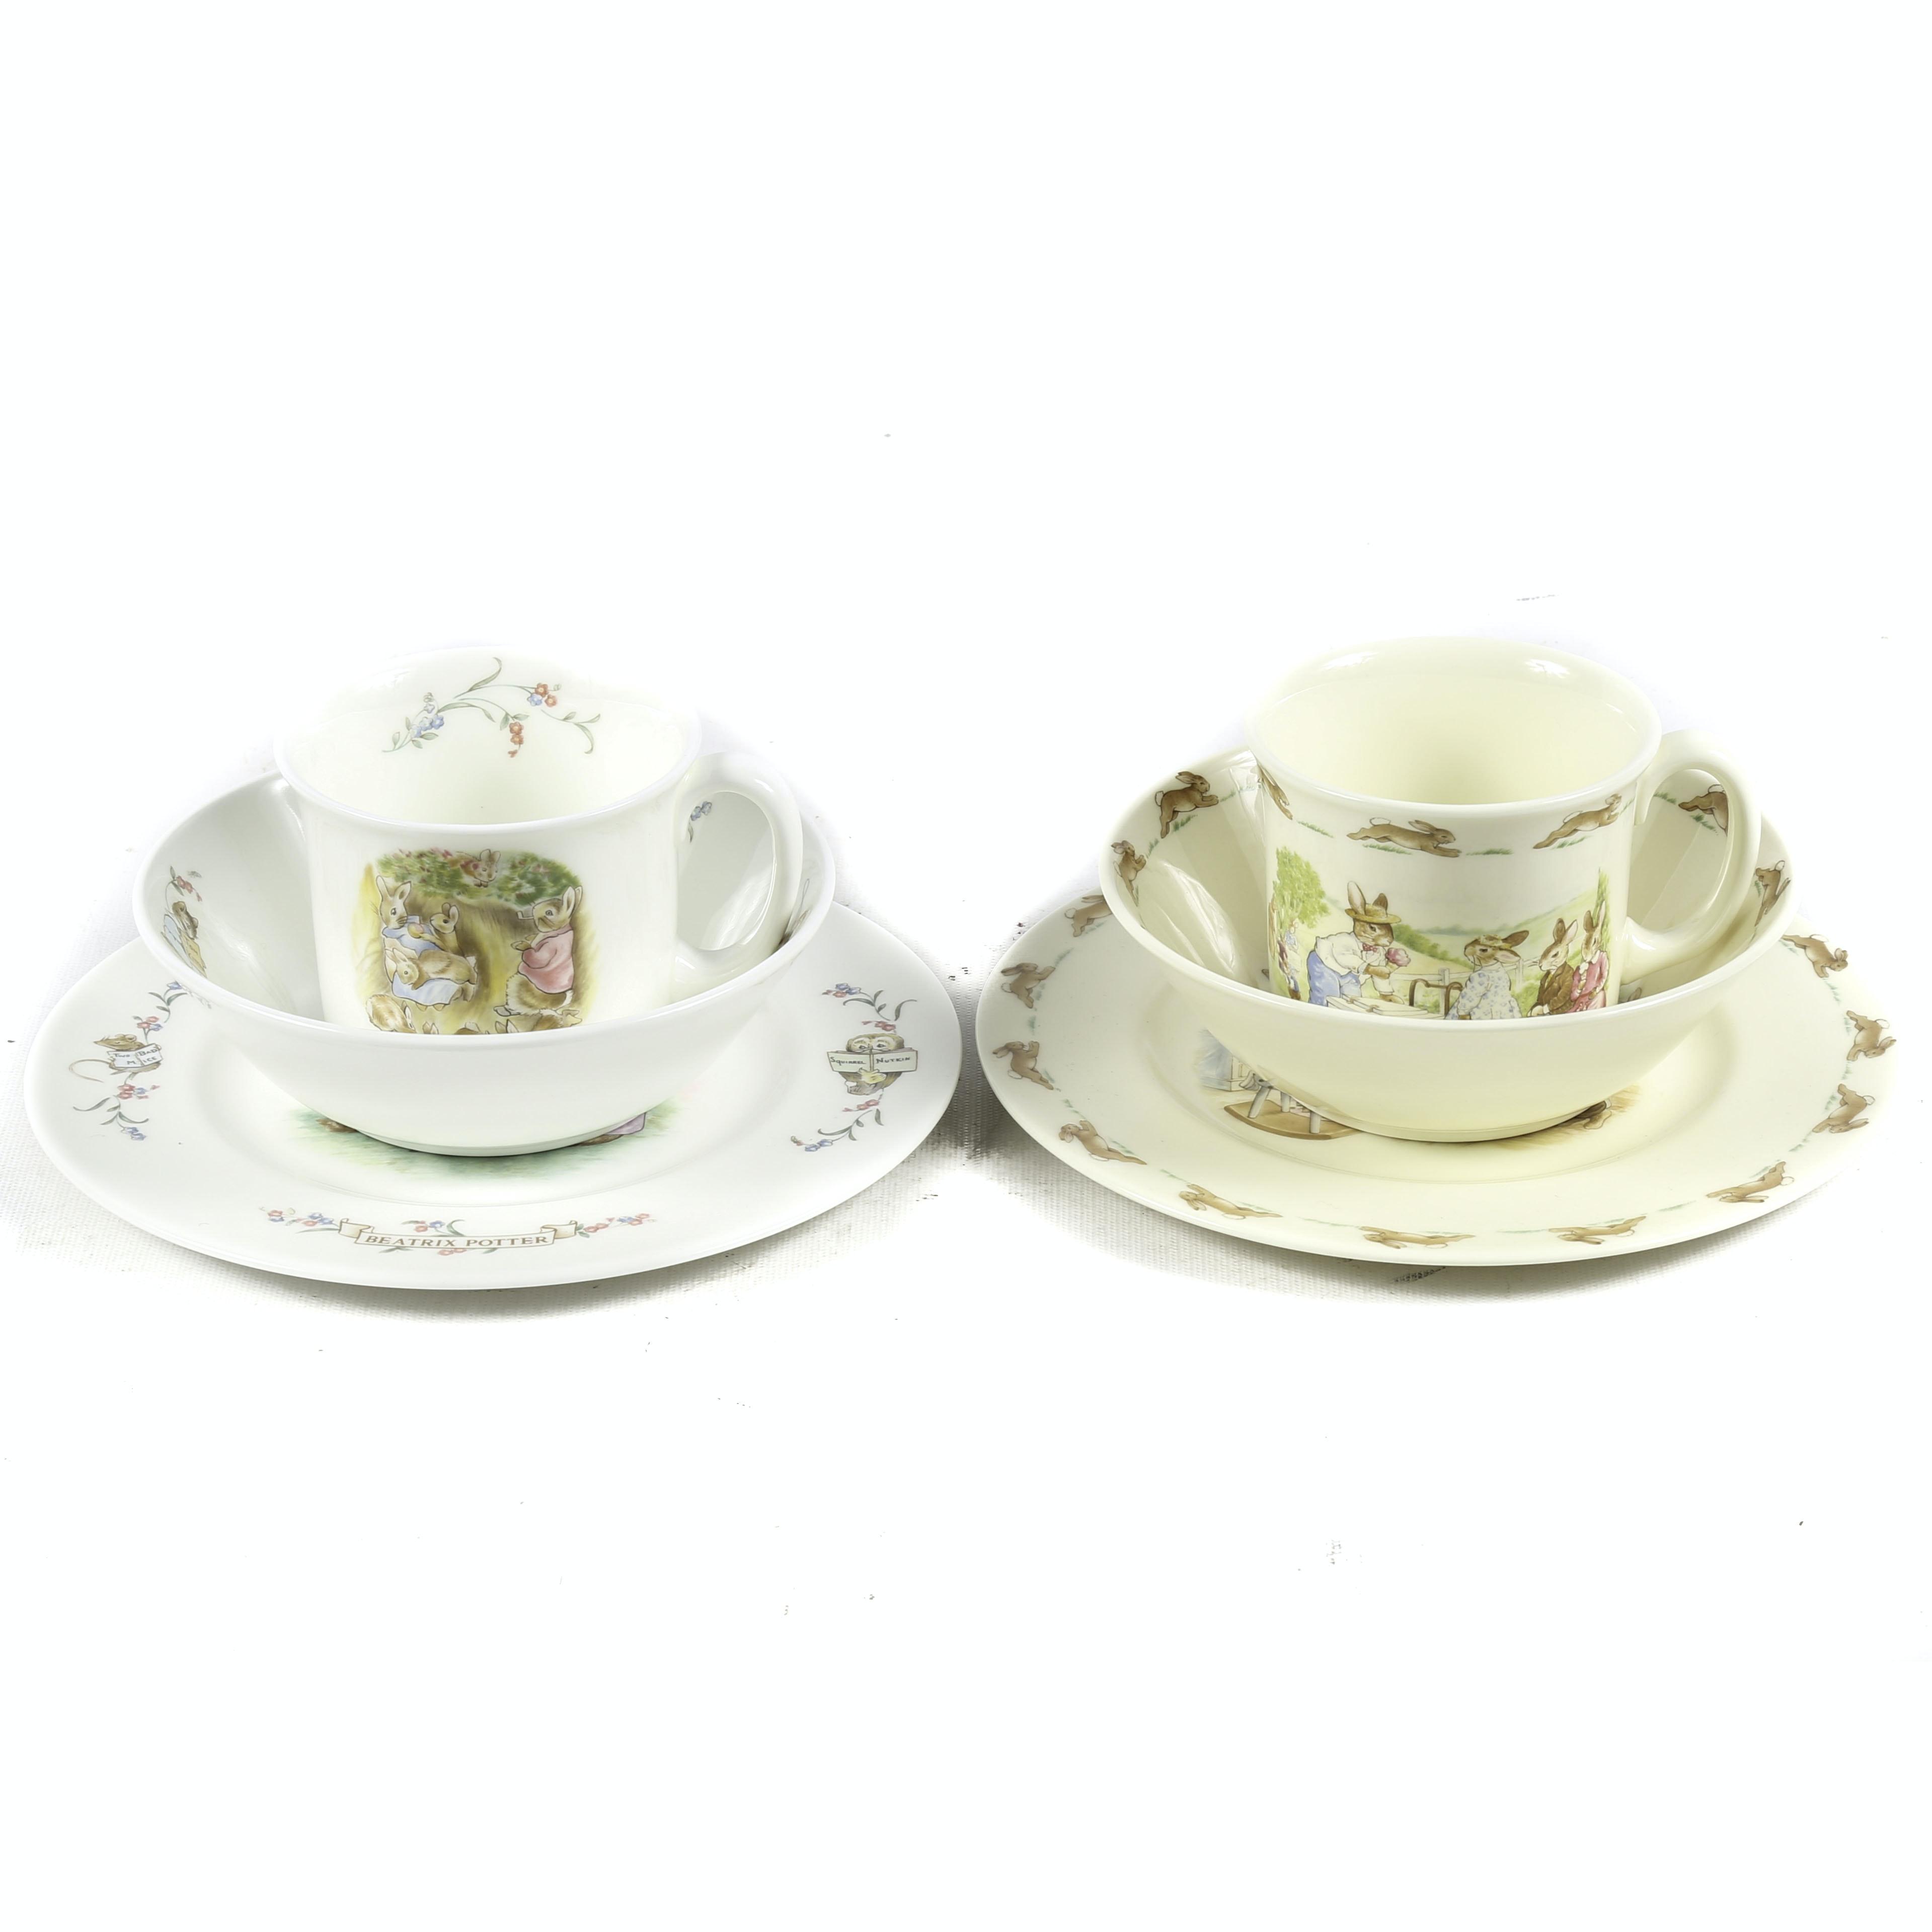 Beatrix Potter and Bunnykins Childrenu0027s Dinnerware ...  sc 1 st  EBTH.com & Beatrix Potter and Bunnykins Childrenu0027s Dinnerware : EBTH